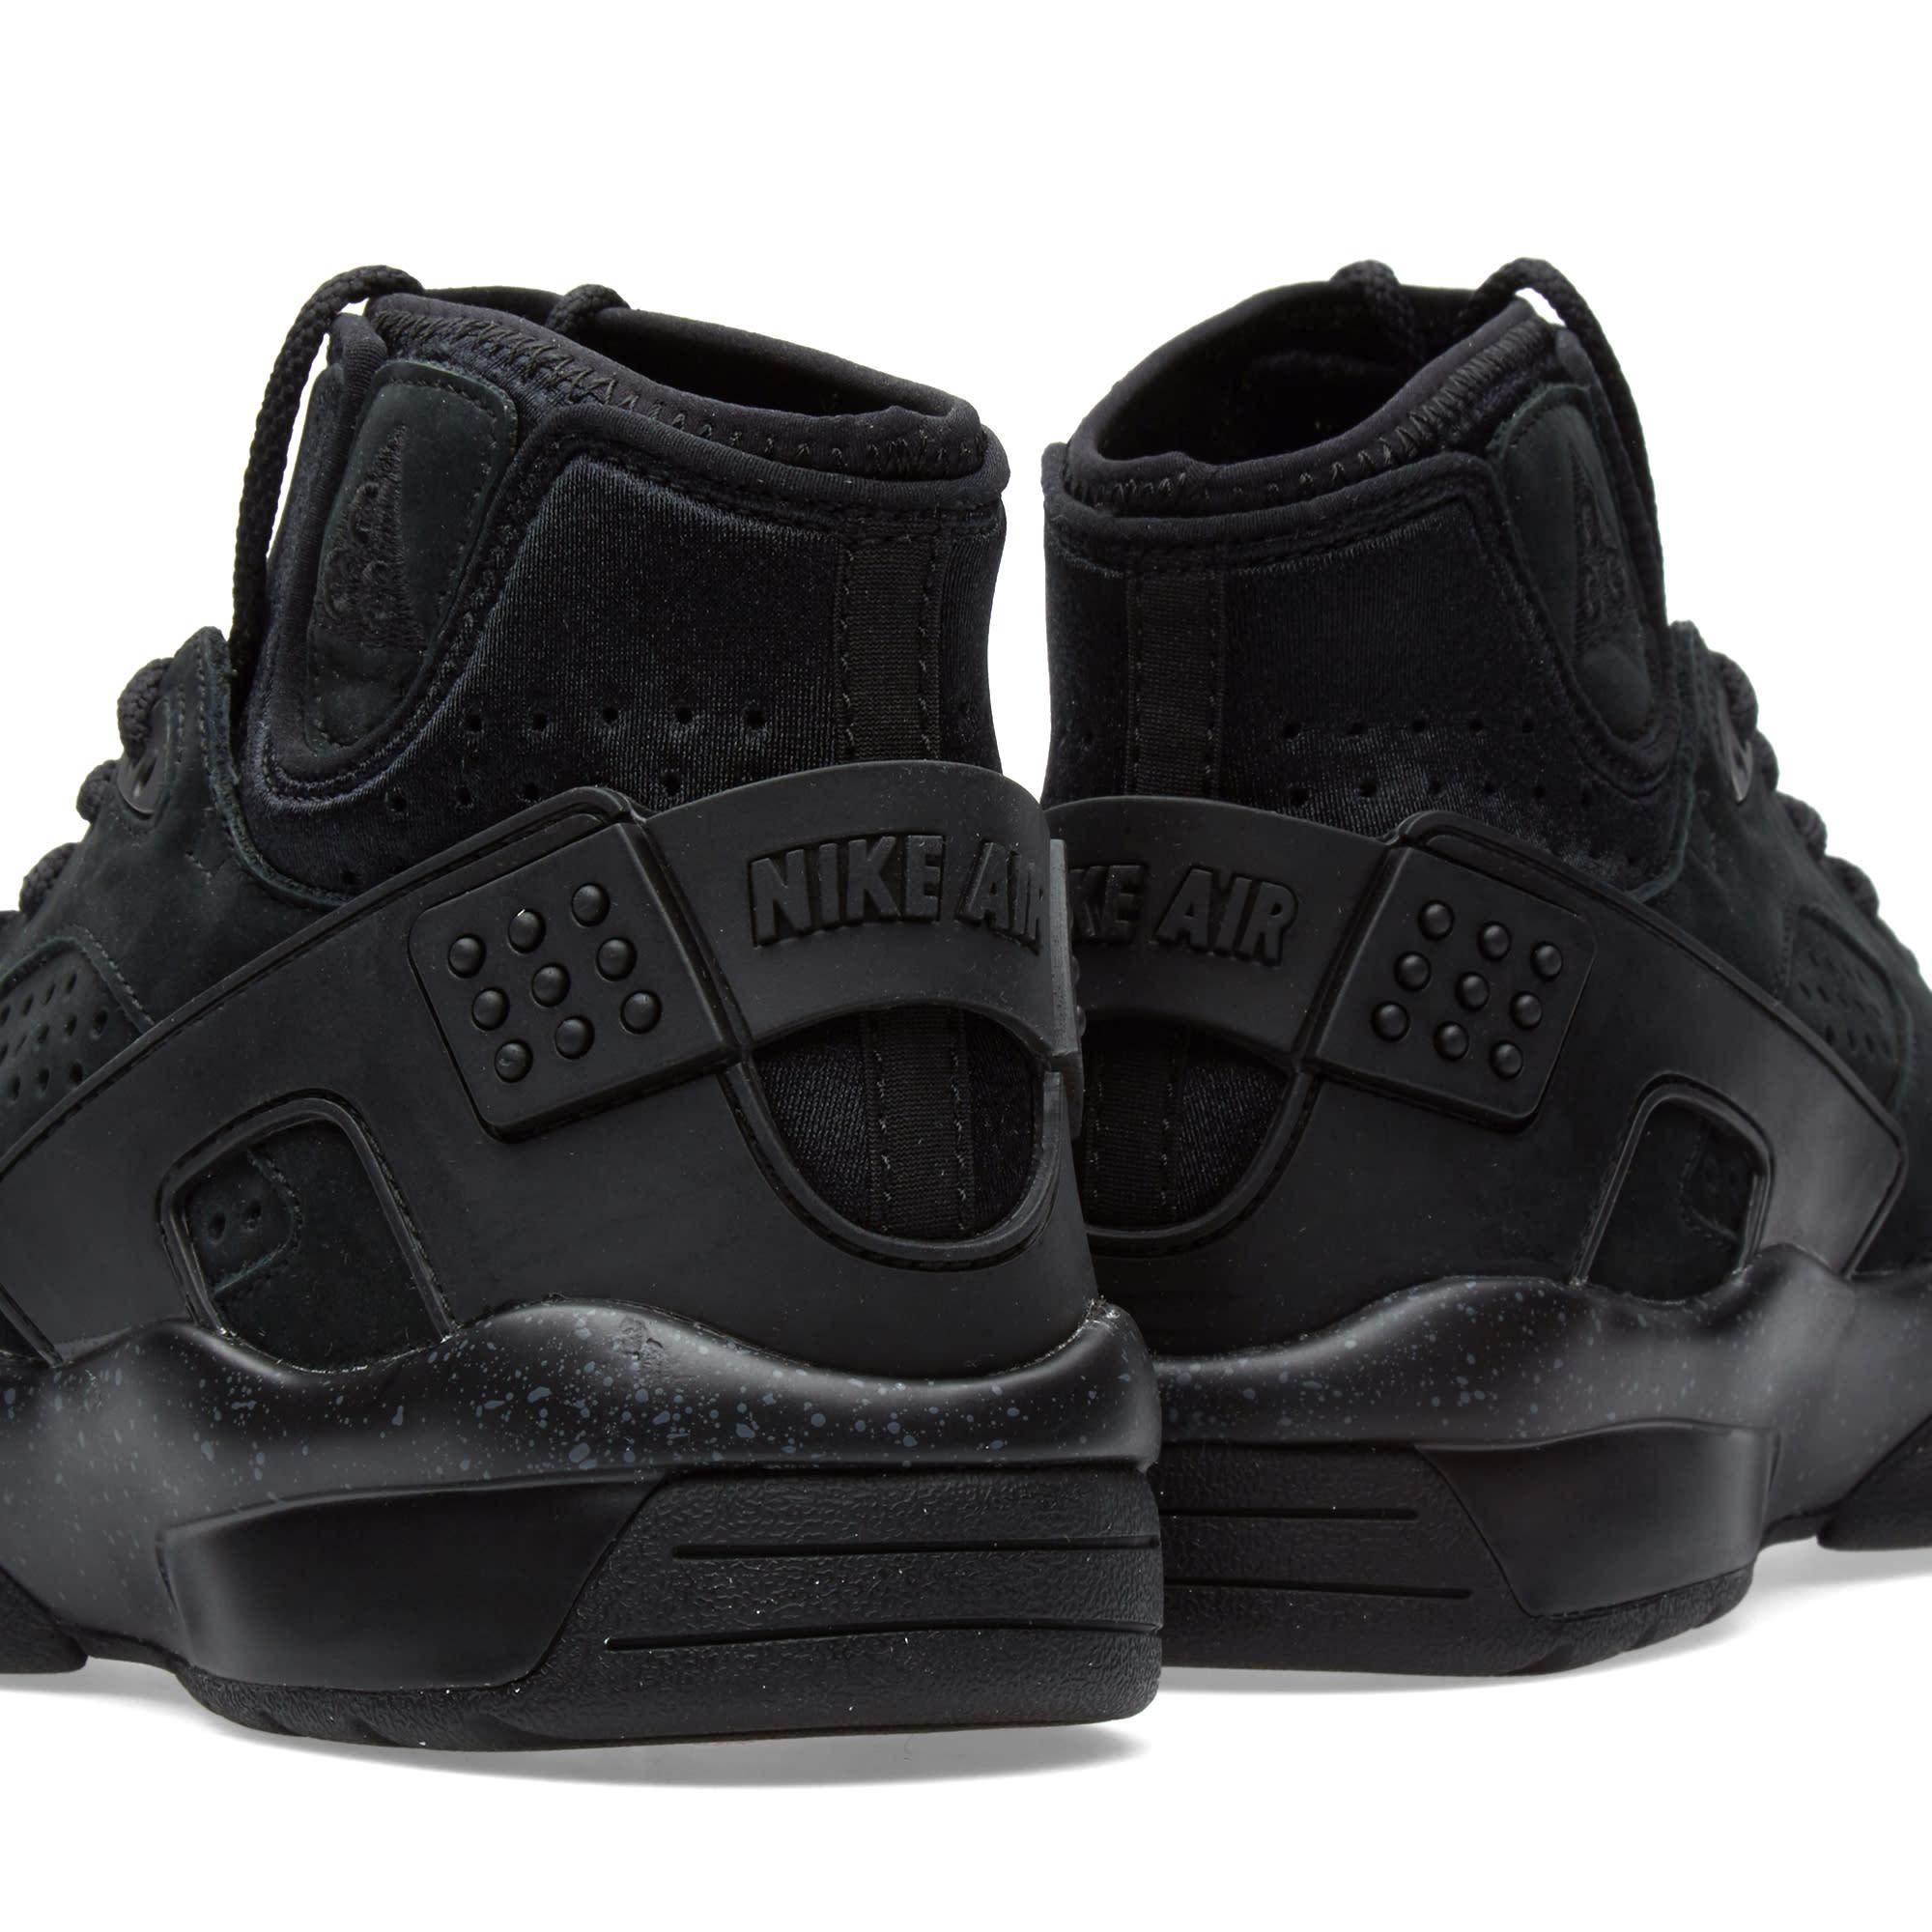 best service e7e59 397a4 Nike Mowabb OG Black, White   Total Orange   END.